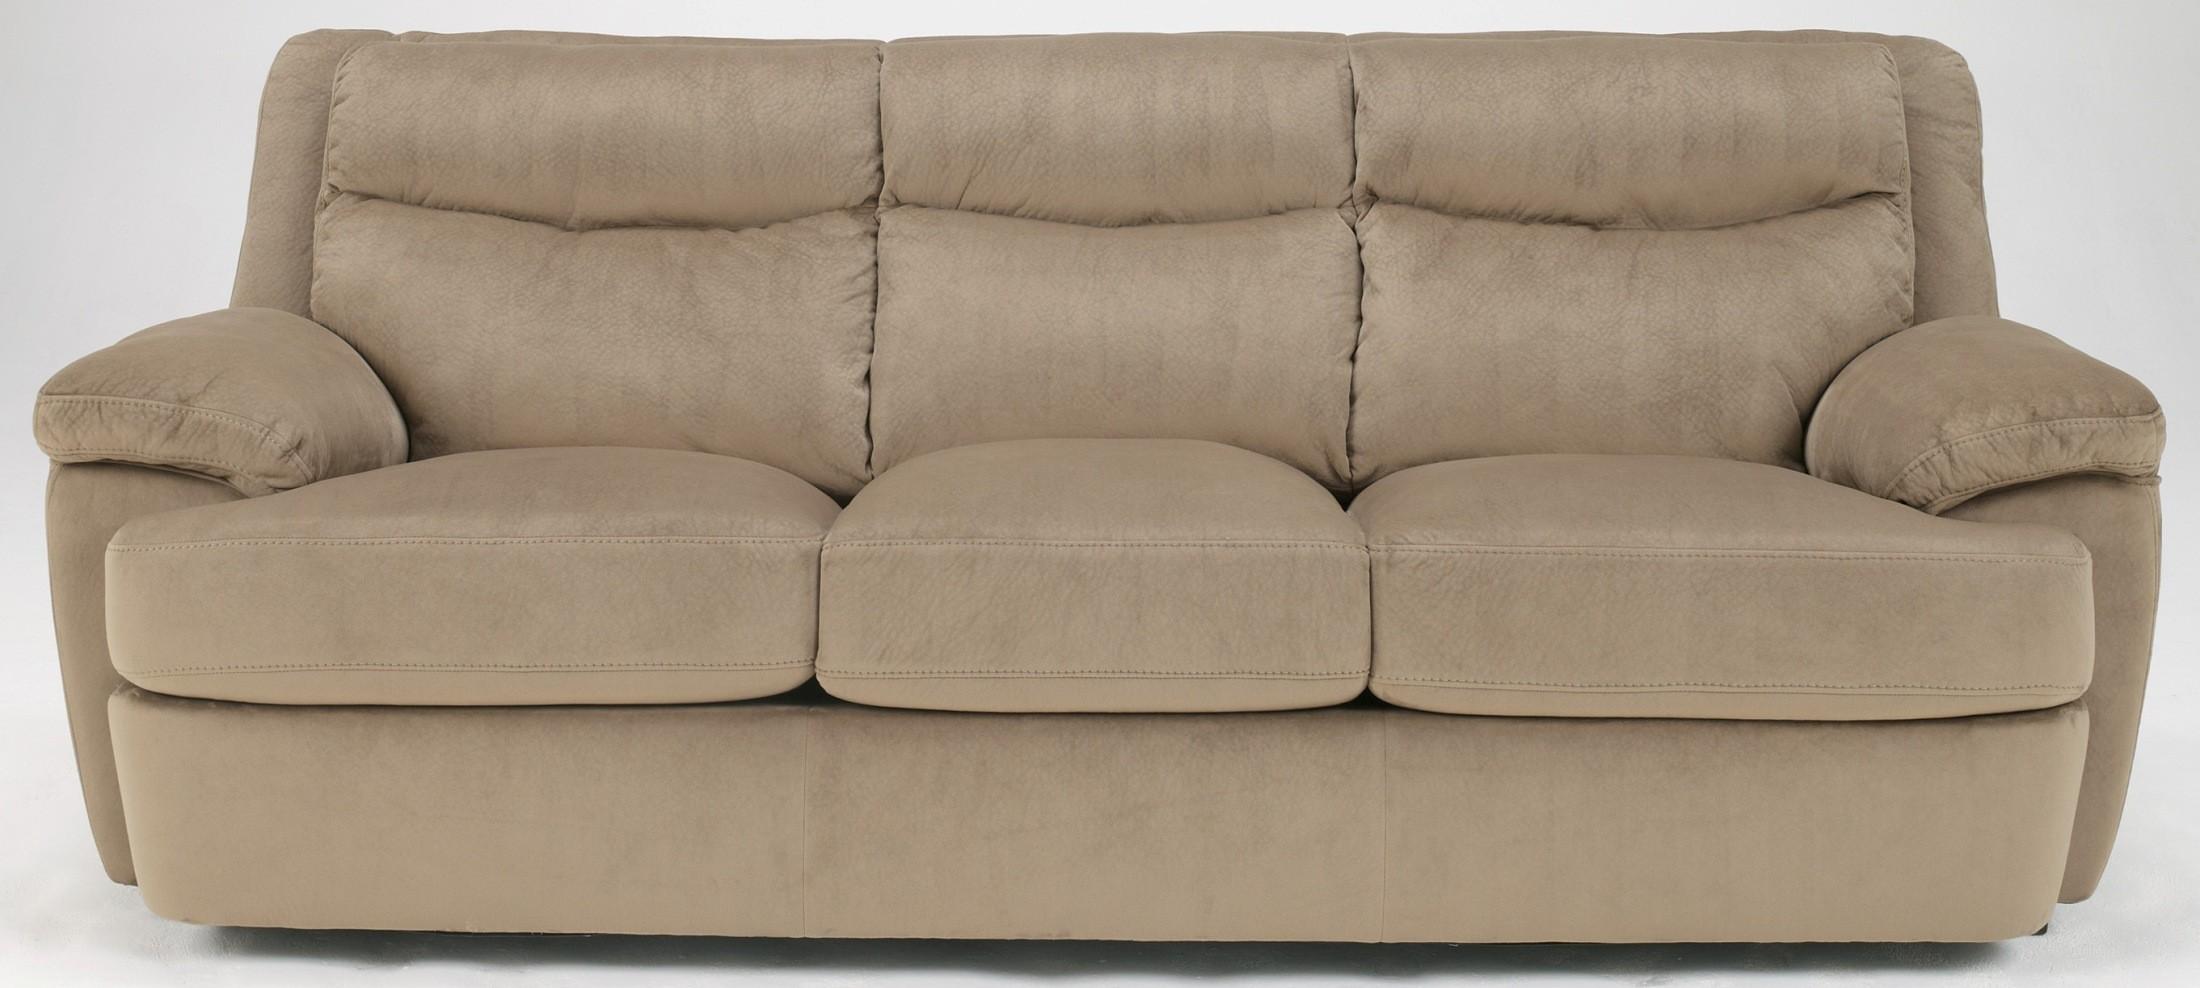 Ashley crinkle plush cocoa living room set 78900 sofa set for Plush living room furniture